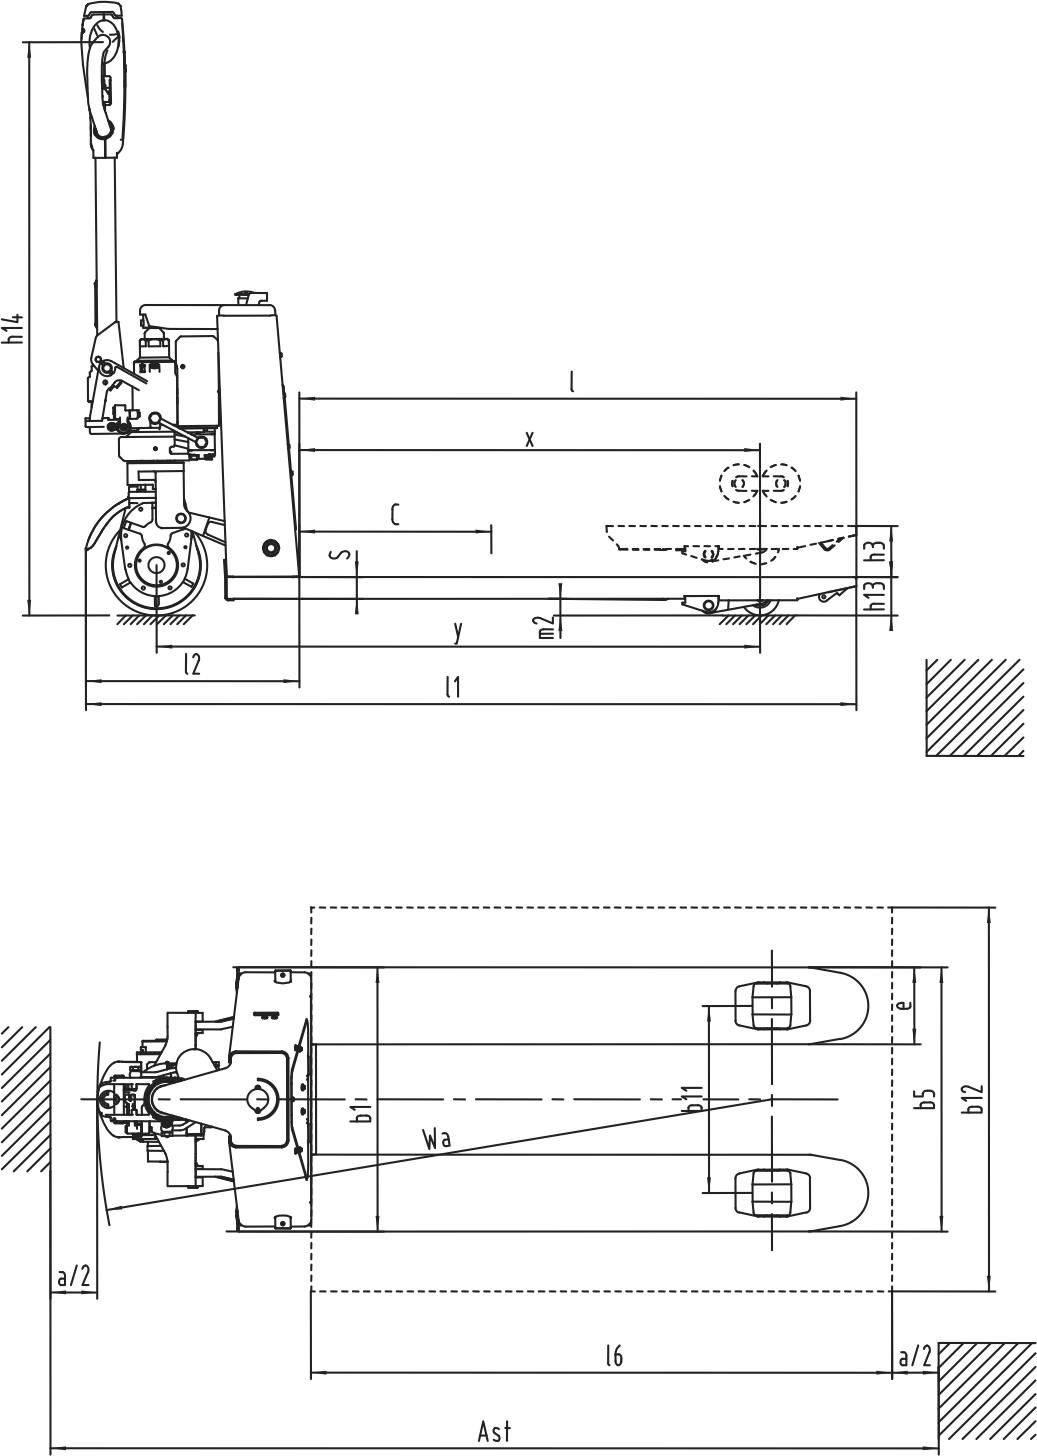 产品线图.png